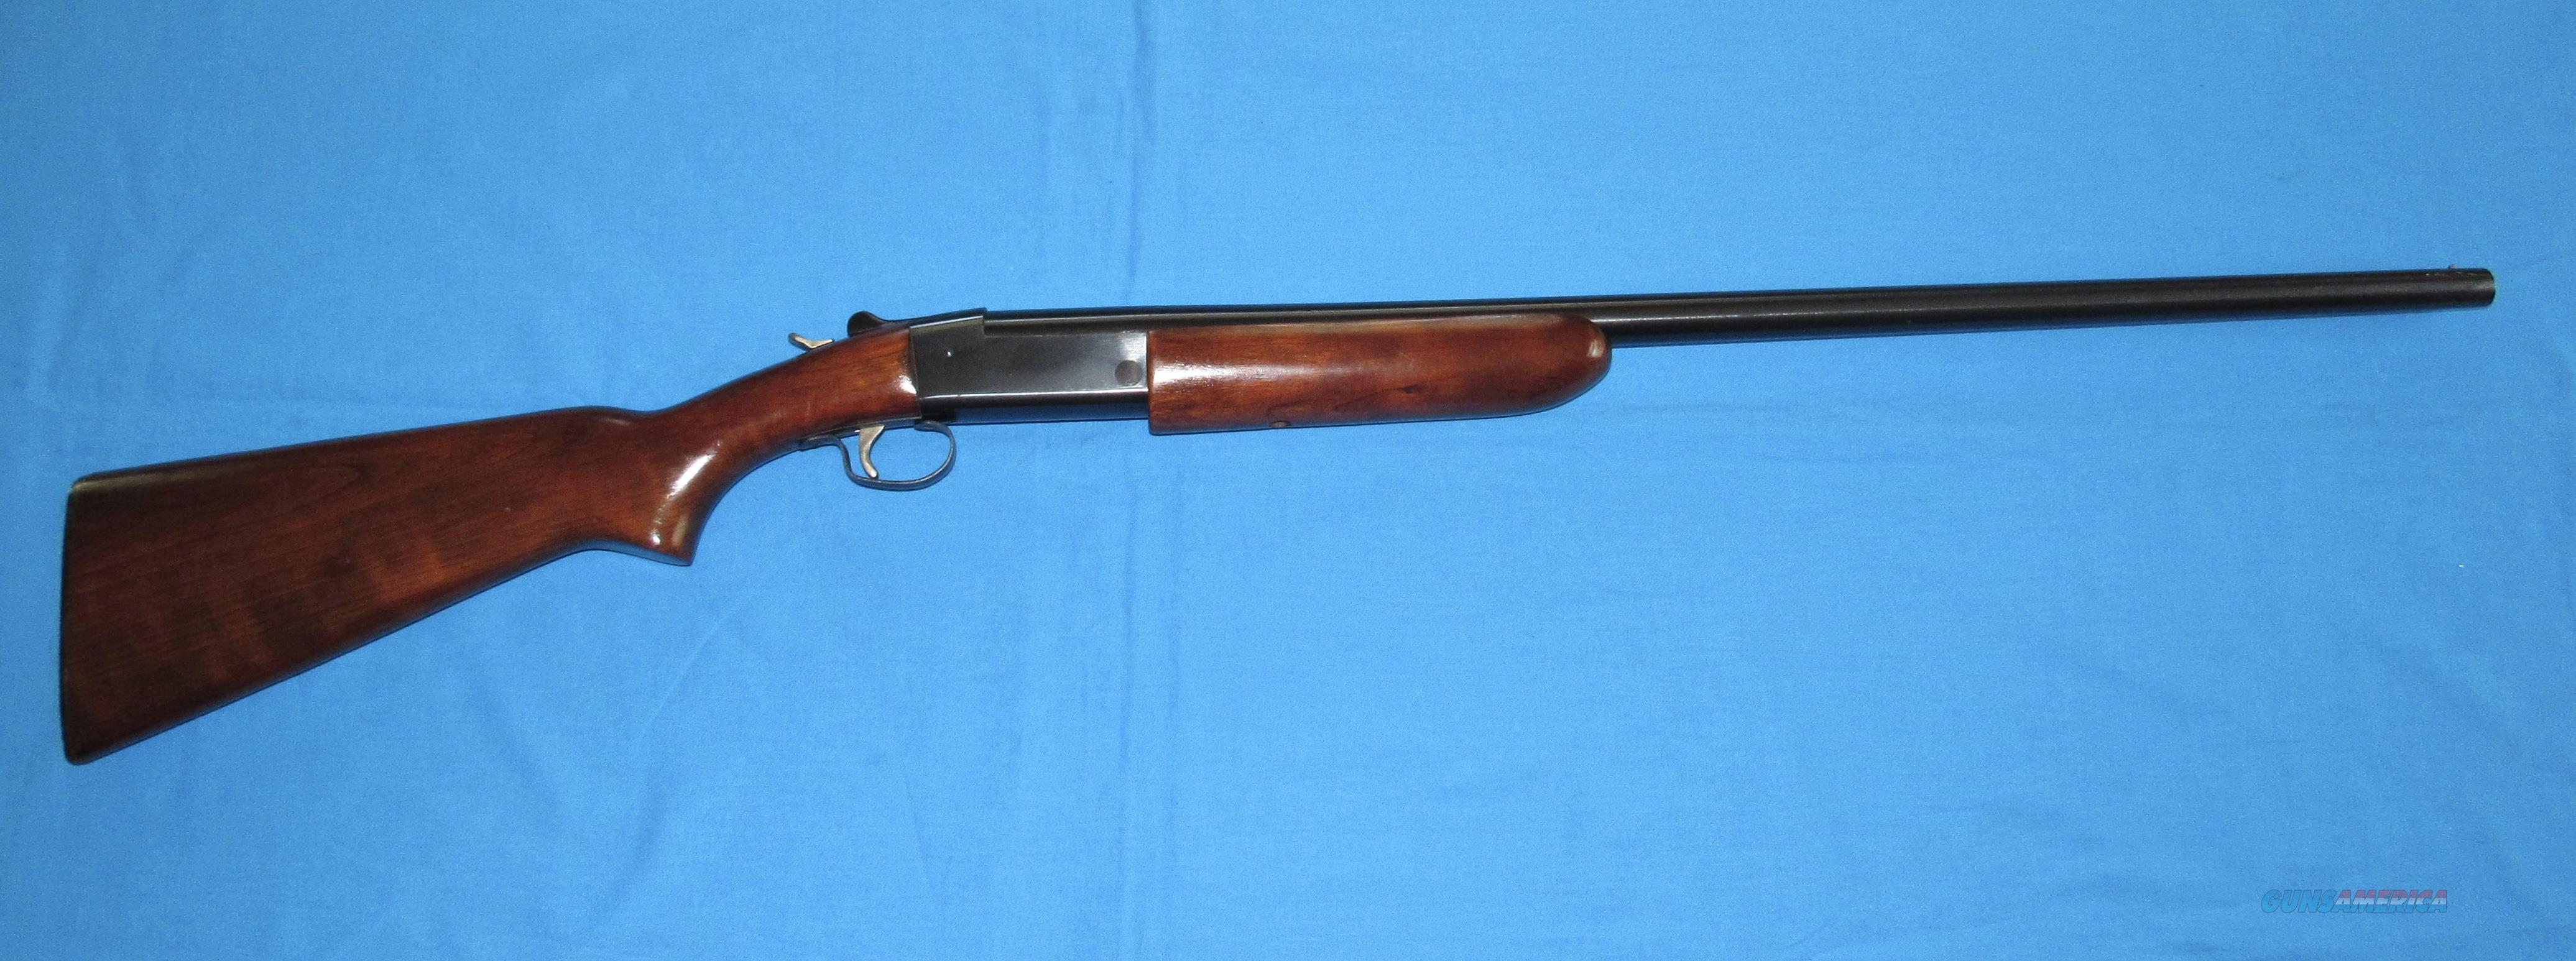 WINCHESTER MODEL 37 16 GAUGE SINGLE SHOT SHOTGUN  Guns > Shotguns > Winchester Shotguns - Modern > Bolt/Single Shot